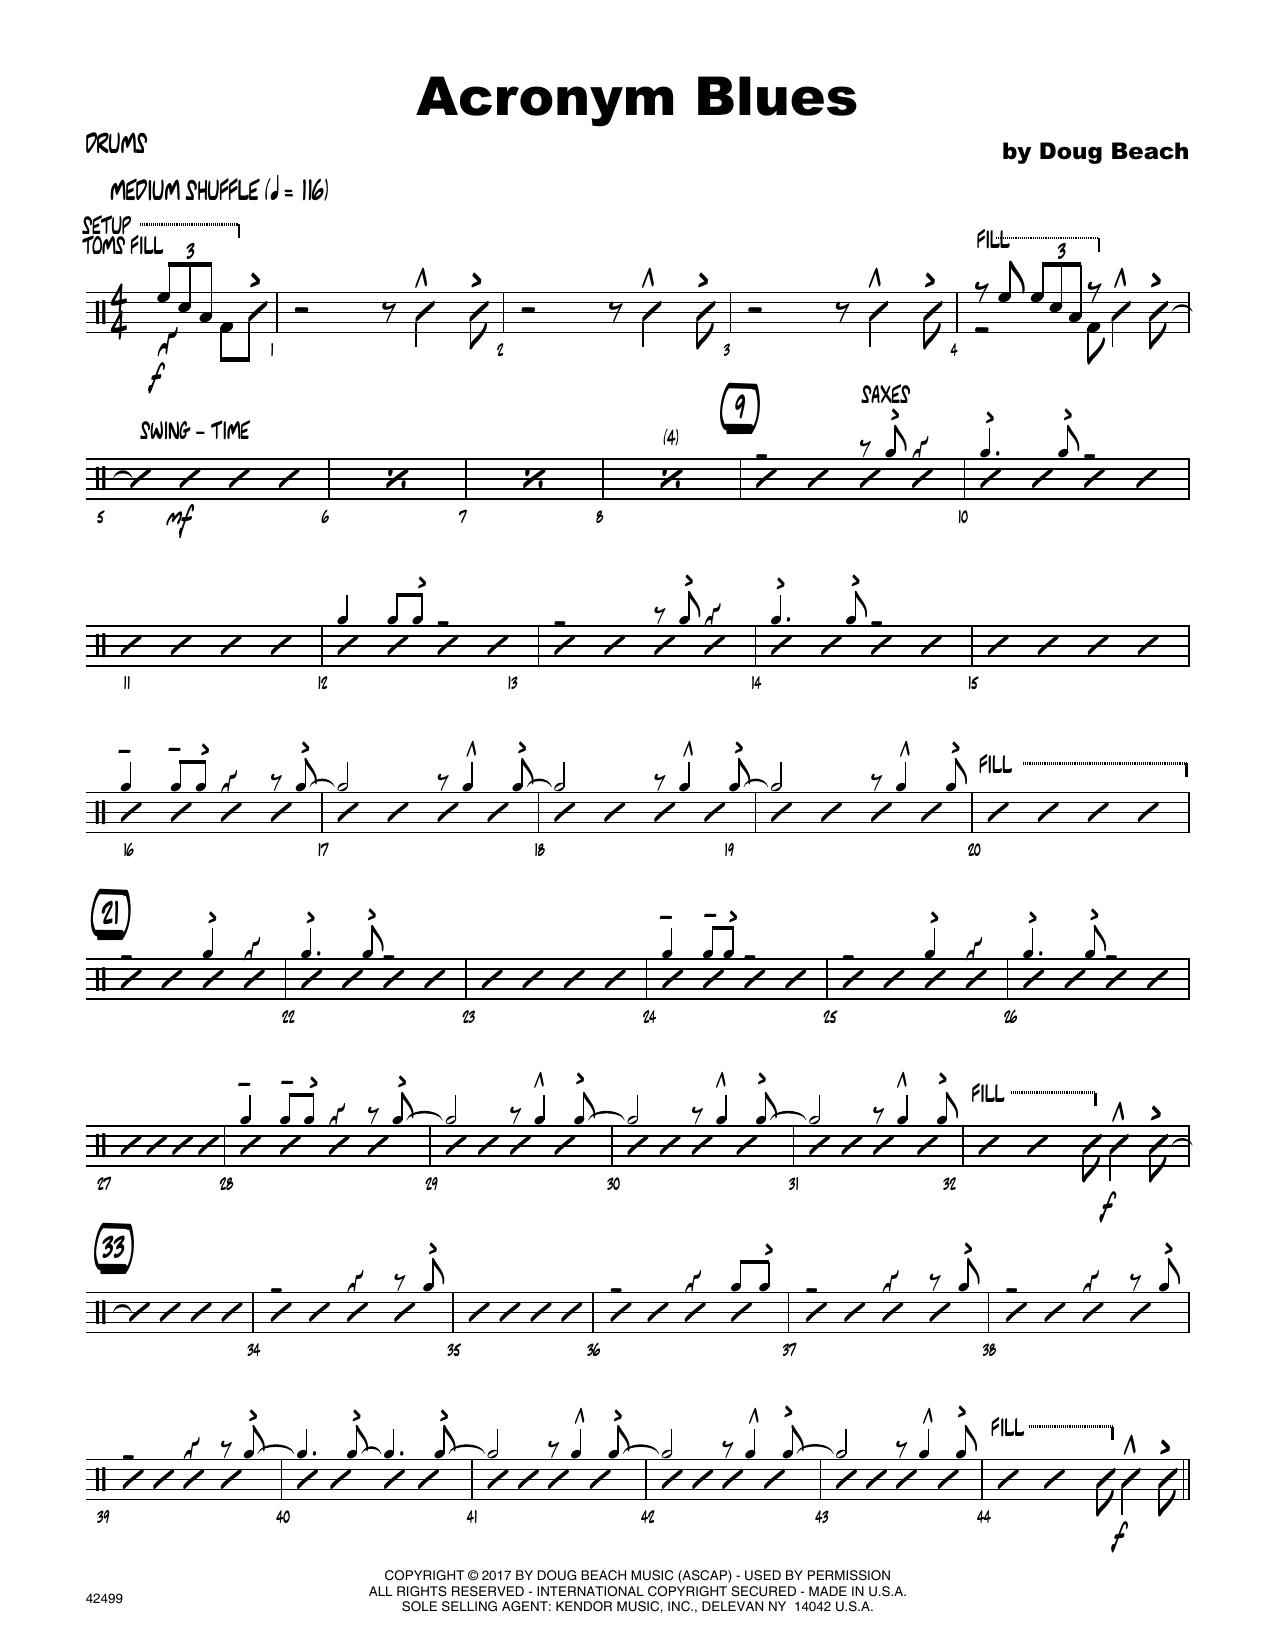 Acronym Blues - Drum Set Sheet Music